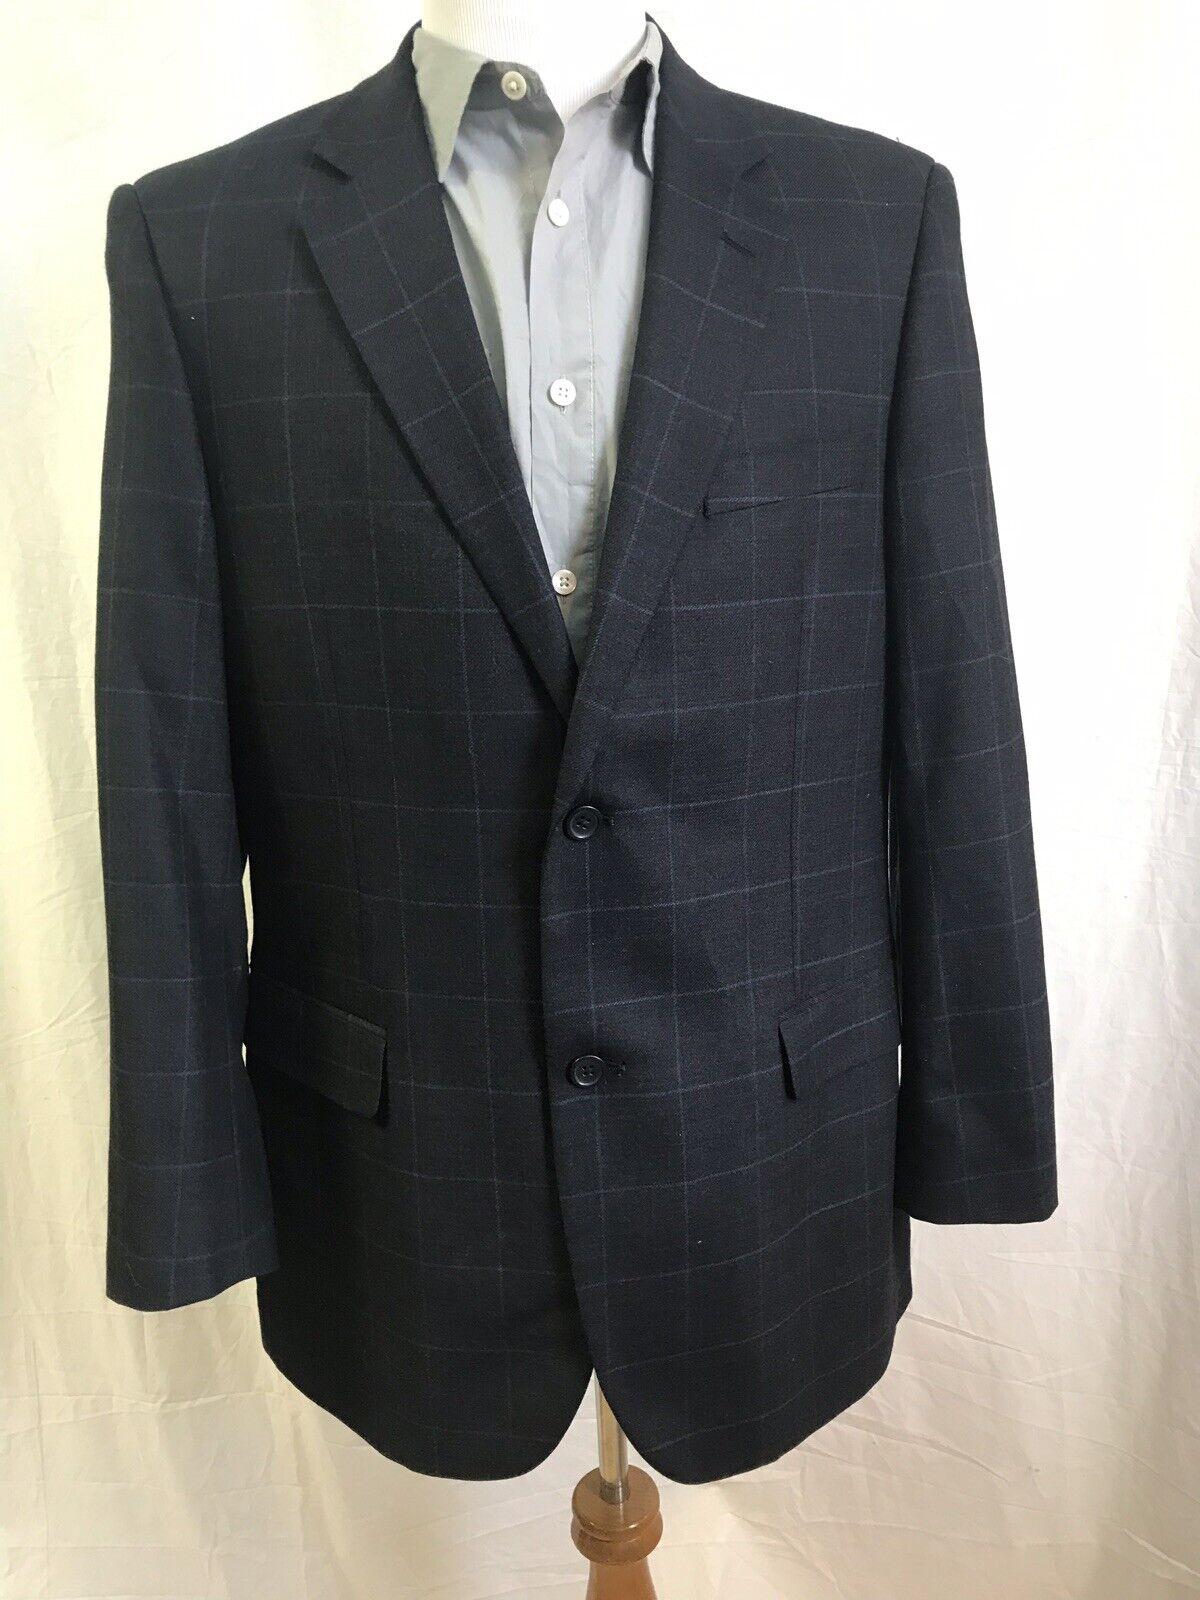 Emanuel Ungaro Fine Wool bluee 2 Button Modern Sportcoat Windowpane Plaid 44R